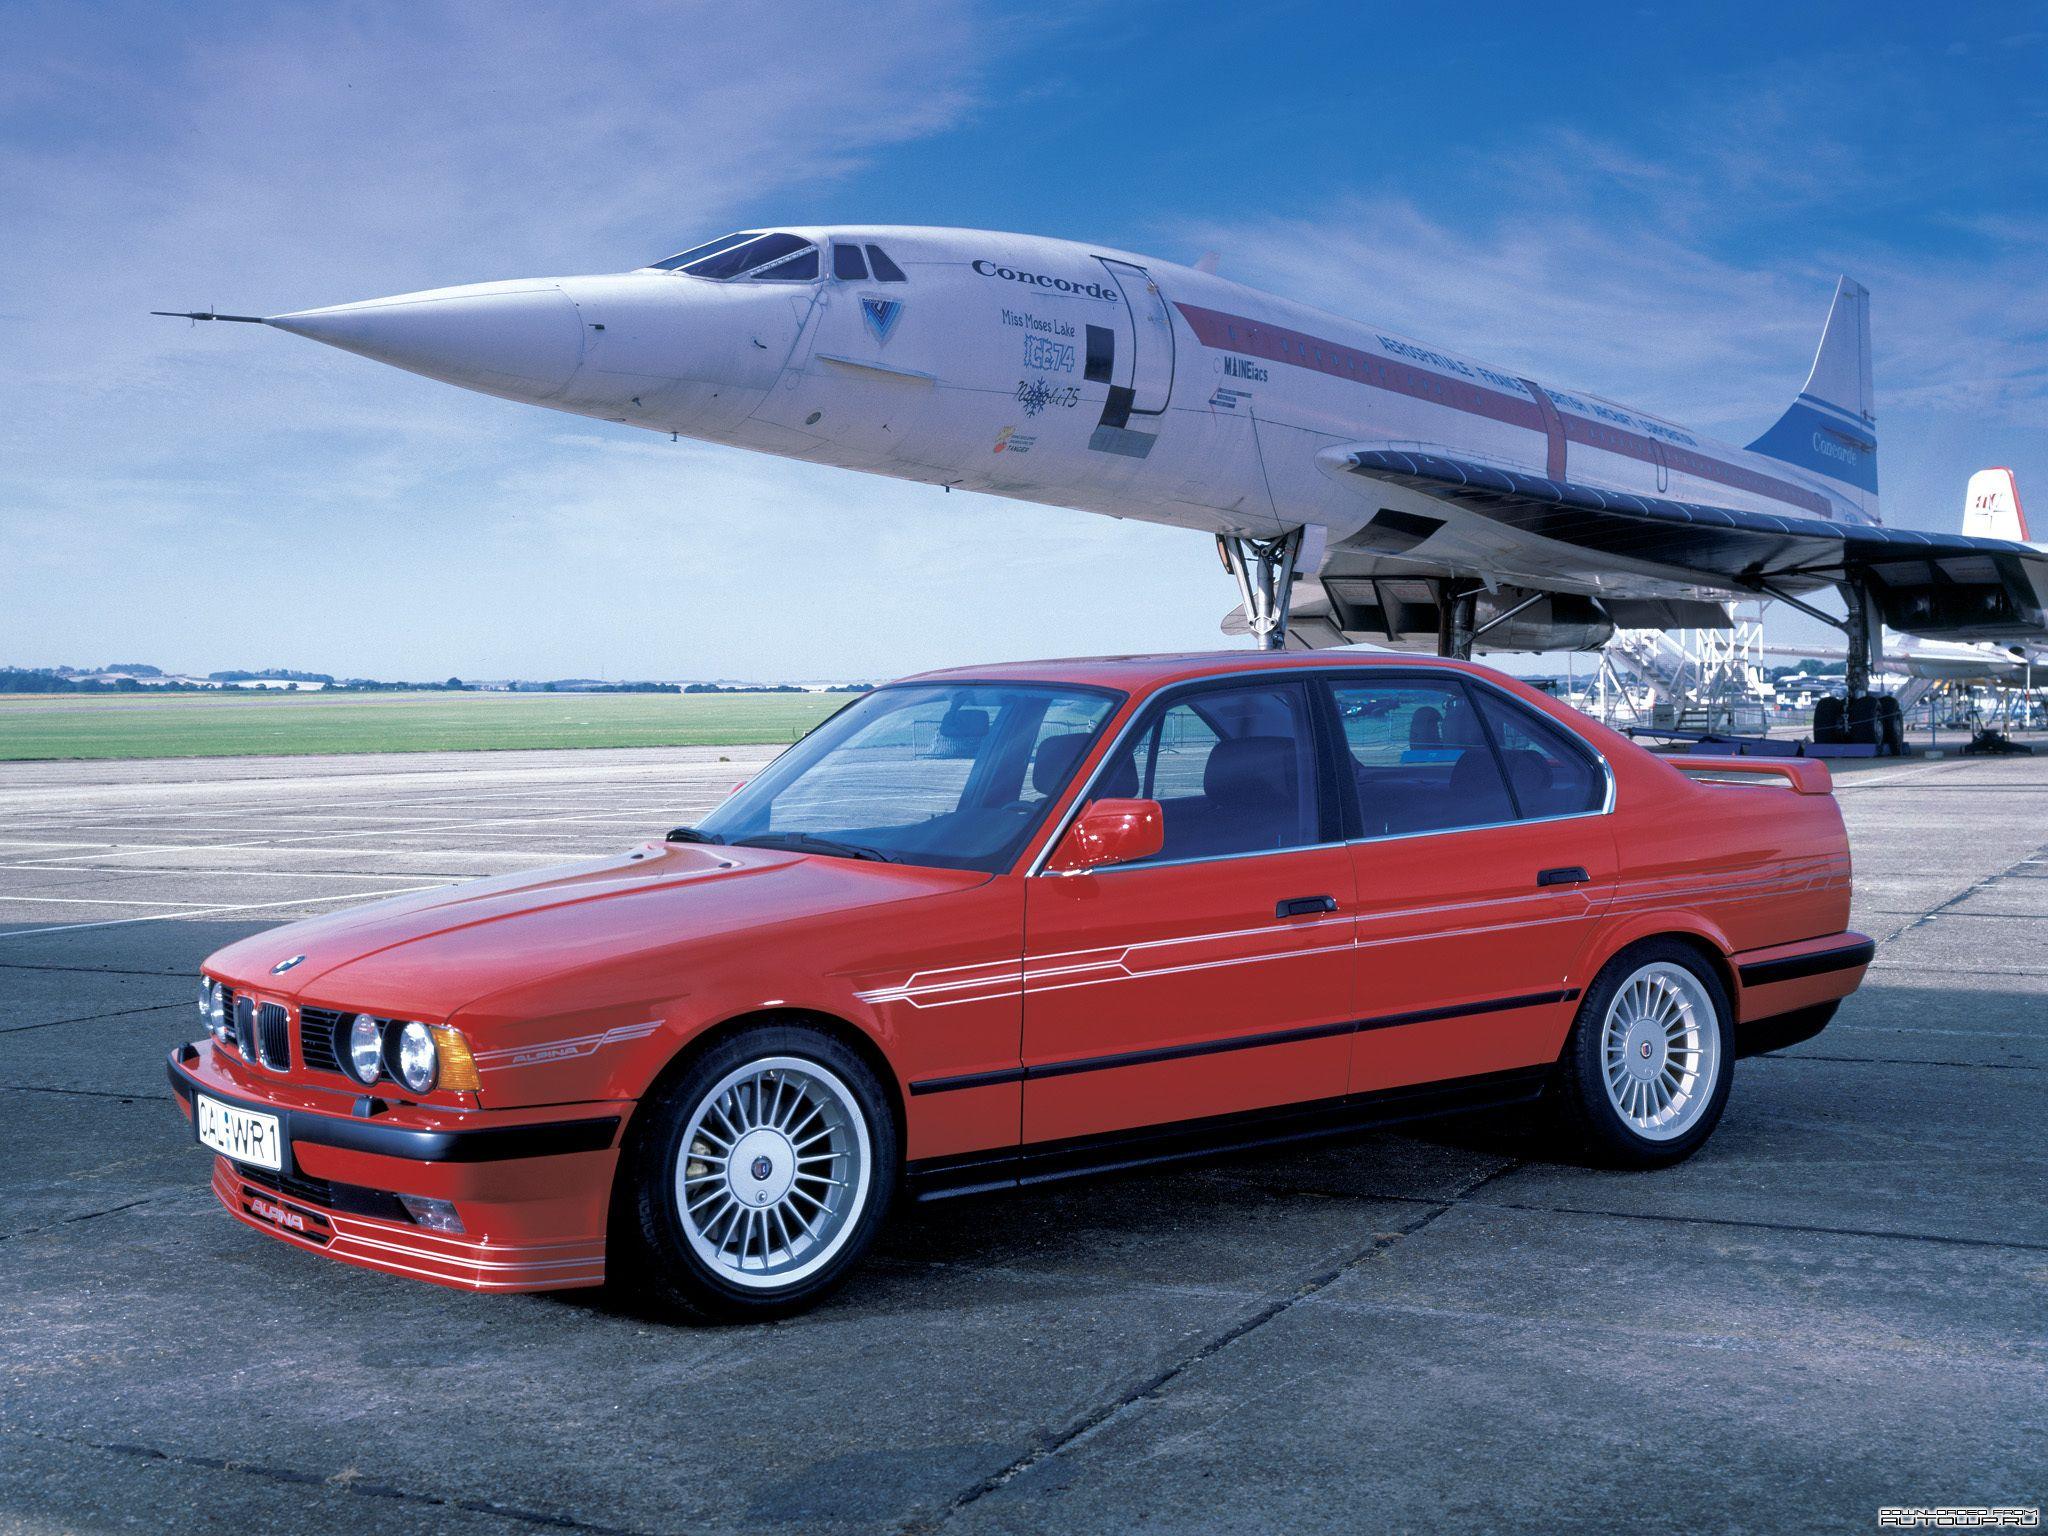 Alpina B10 Biturbo Bmw Alpina Bmw E34 Bmw Classic